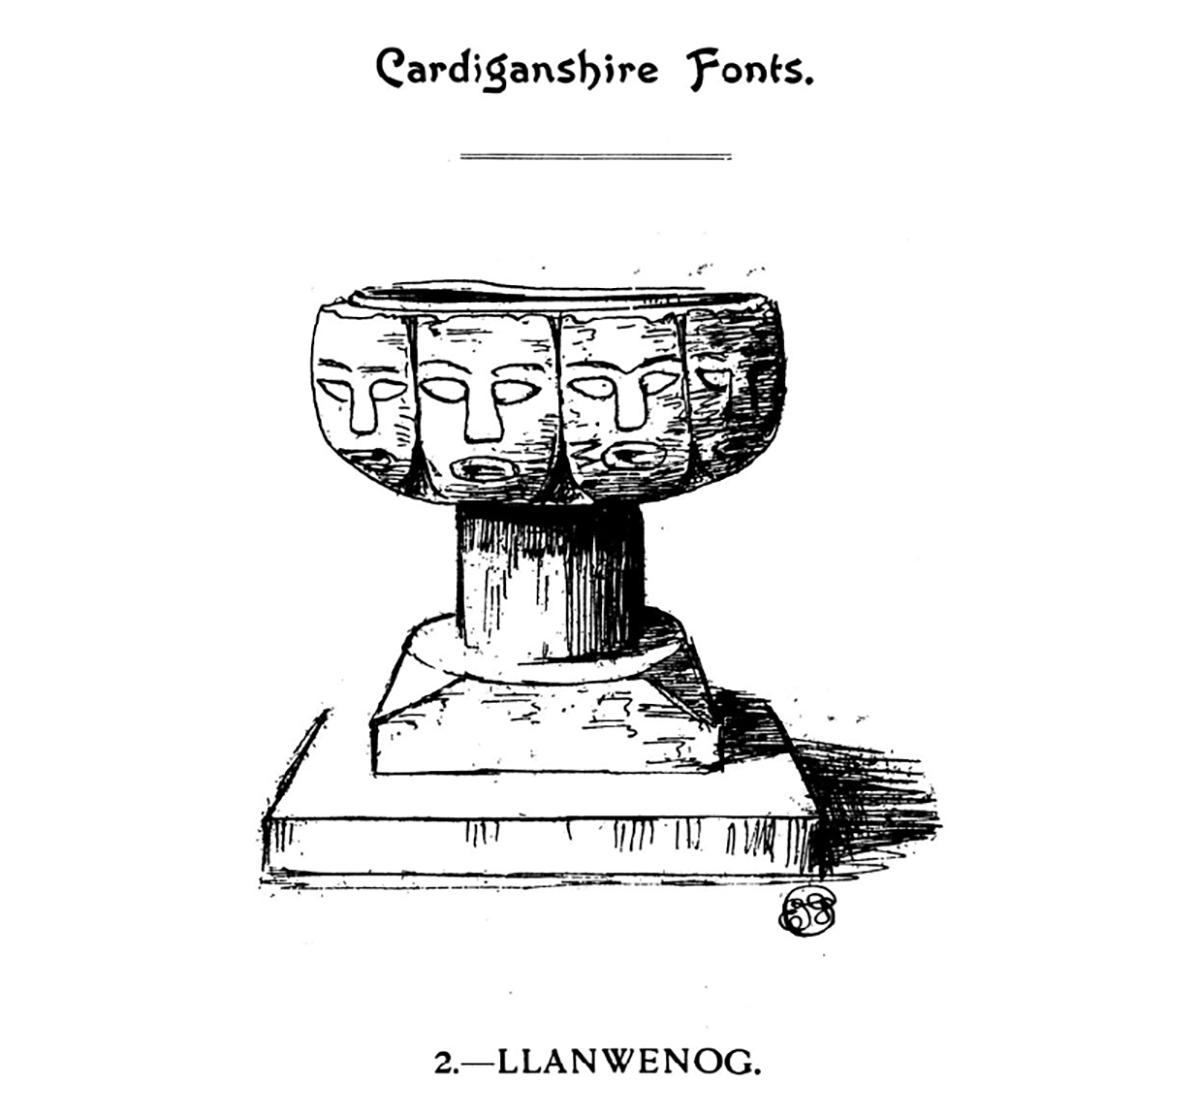 Cardiganshire Fonts - Llanwenog